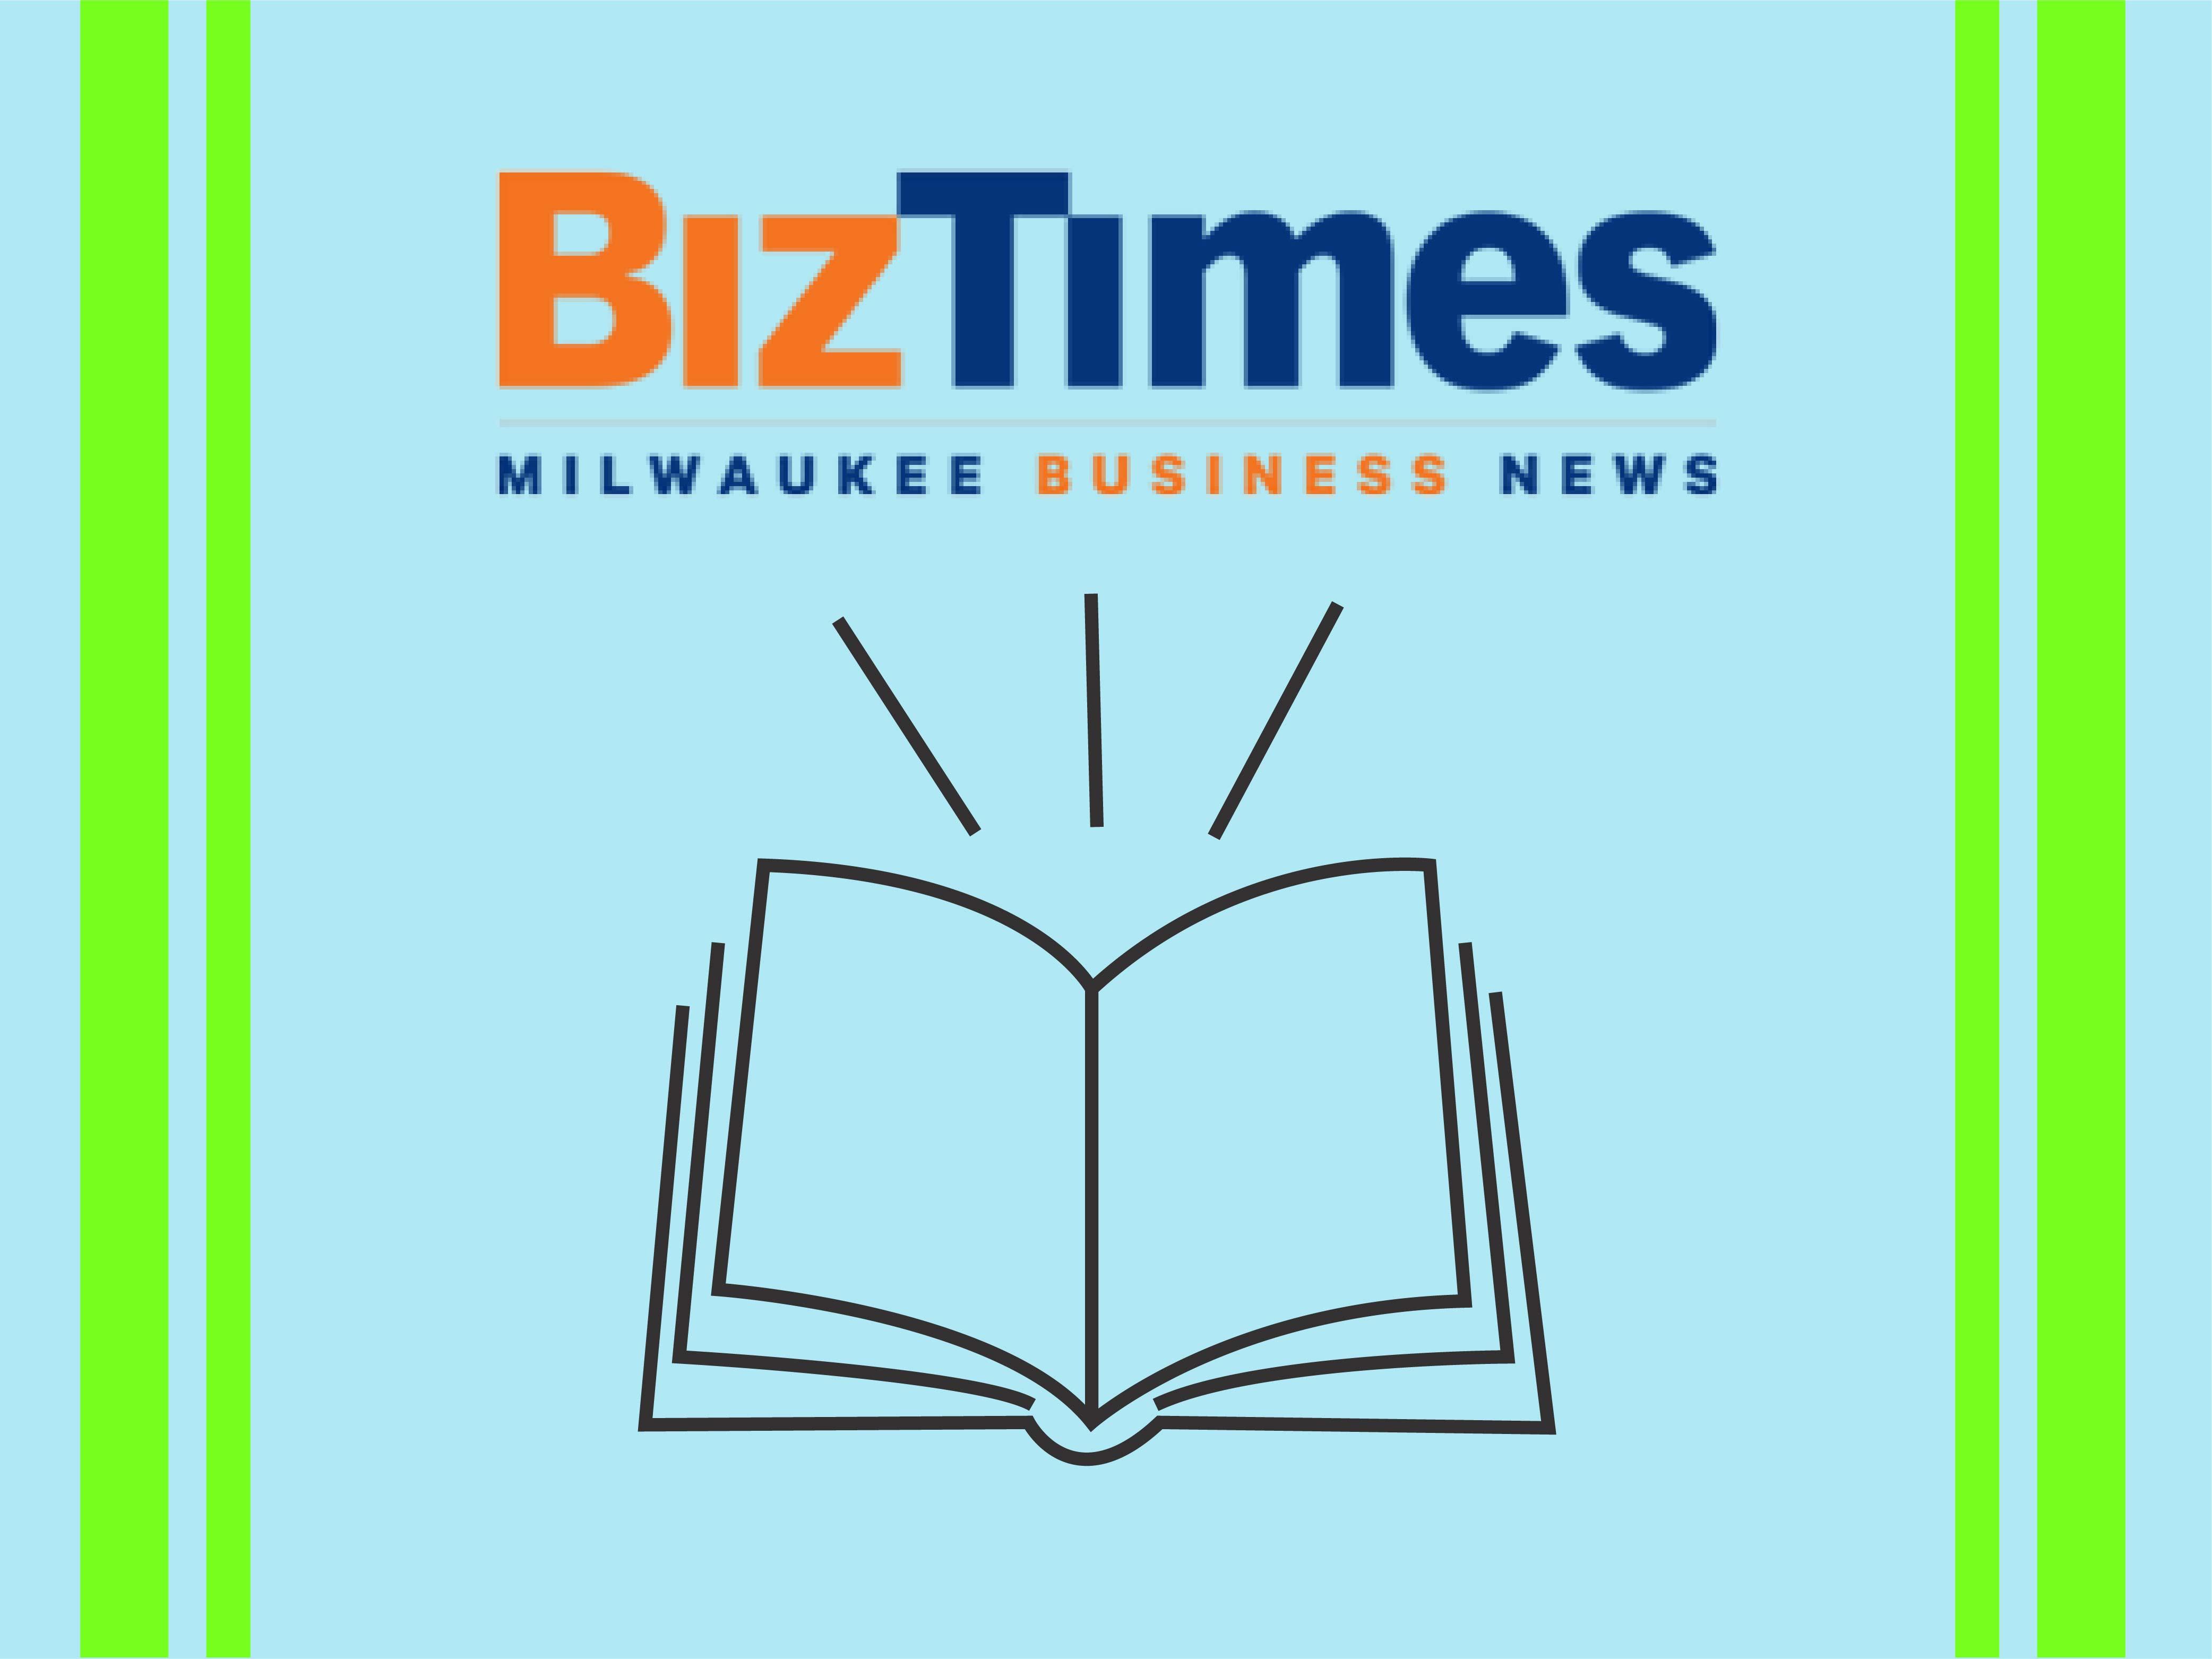 TG-web-article-thumbs-1000×700-BizTimes